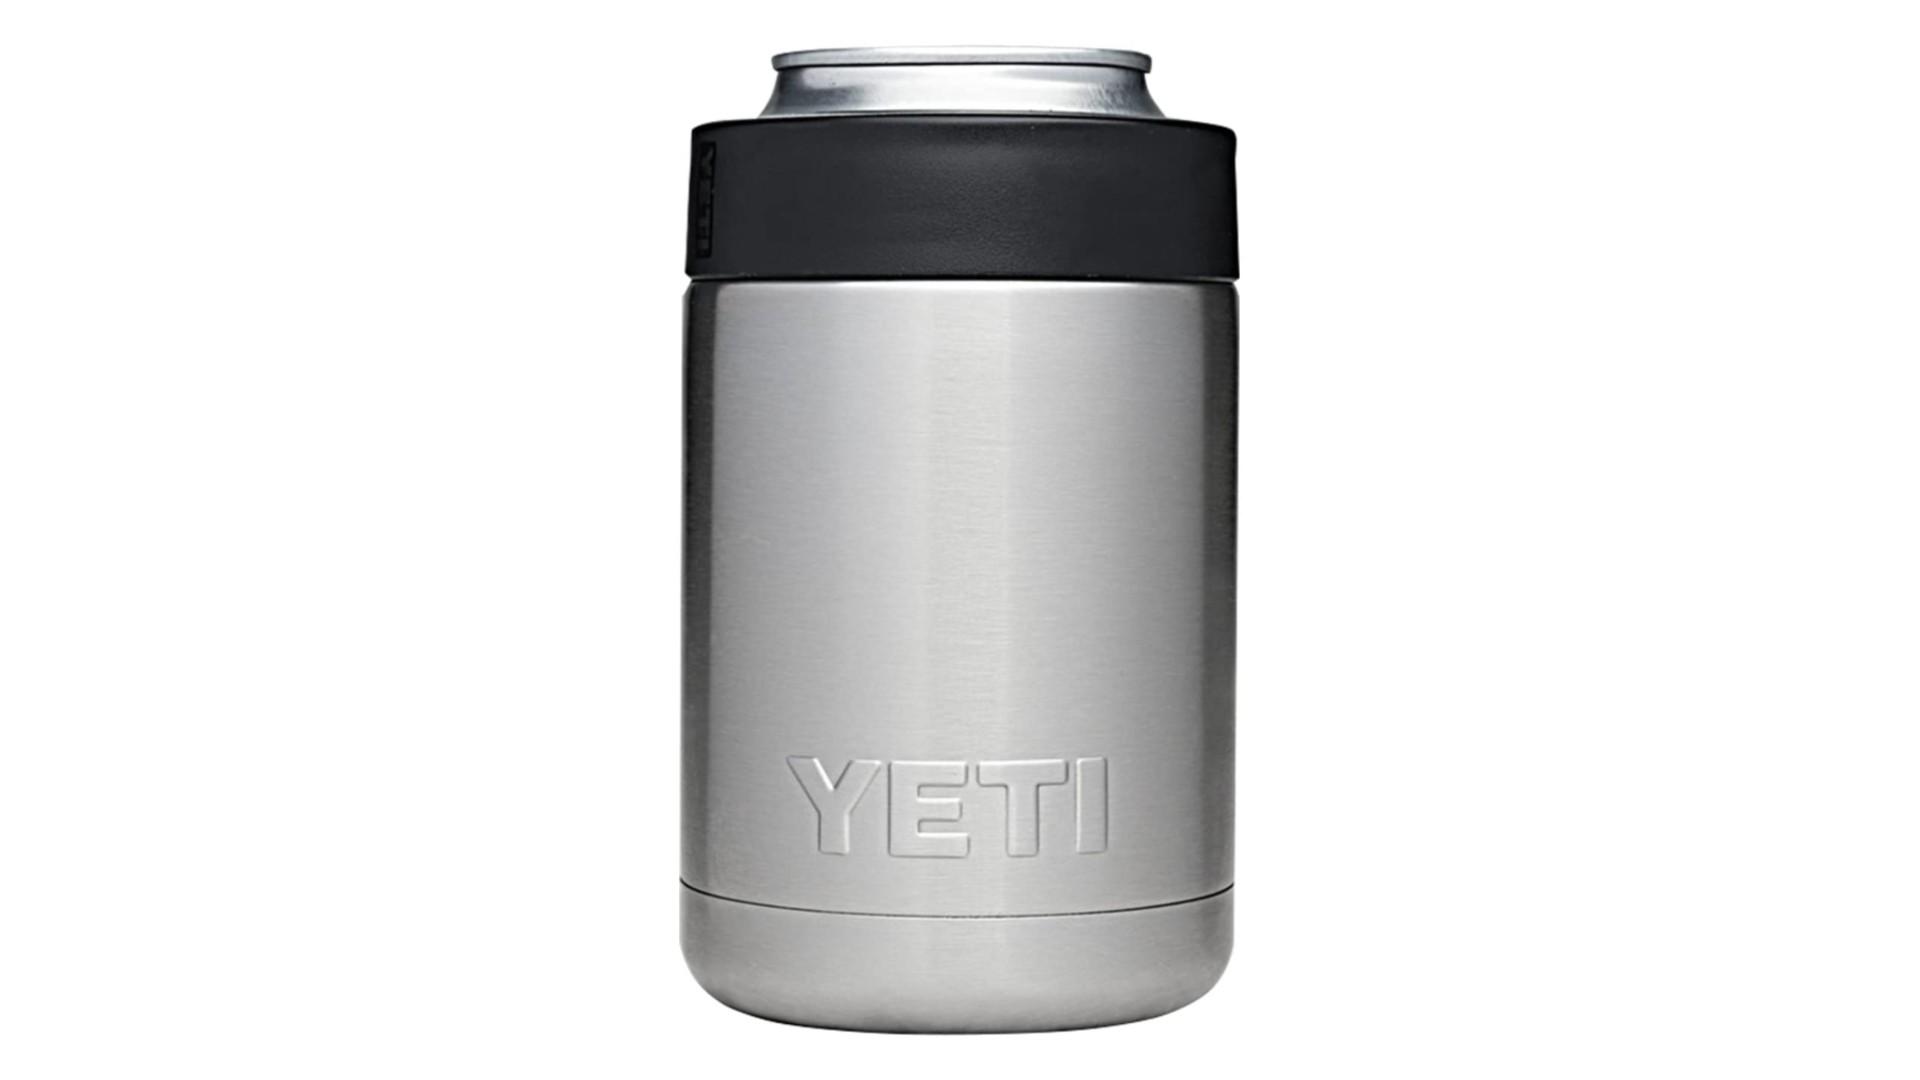 YETI Stainless Steel Rambler